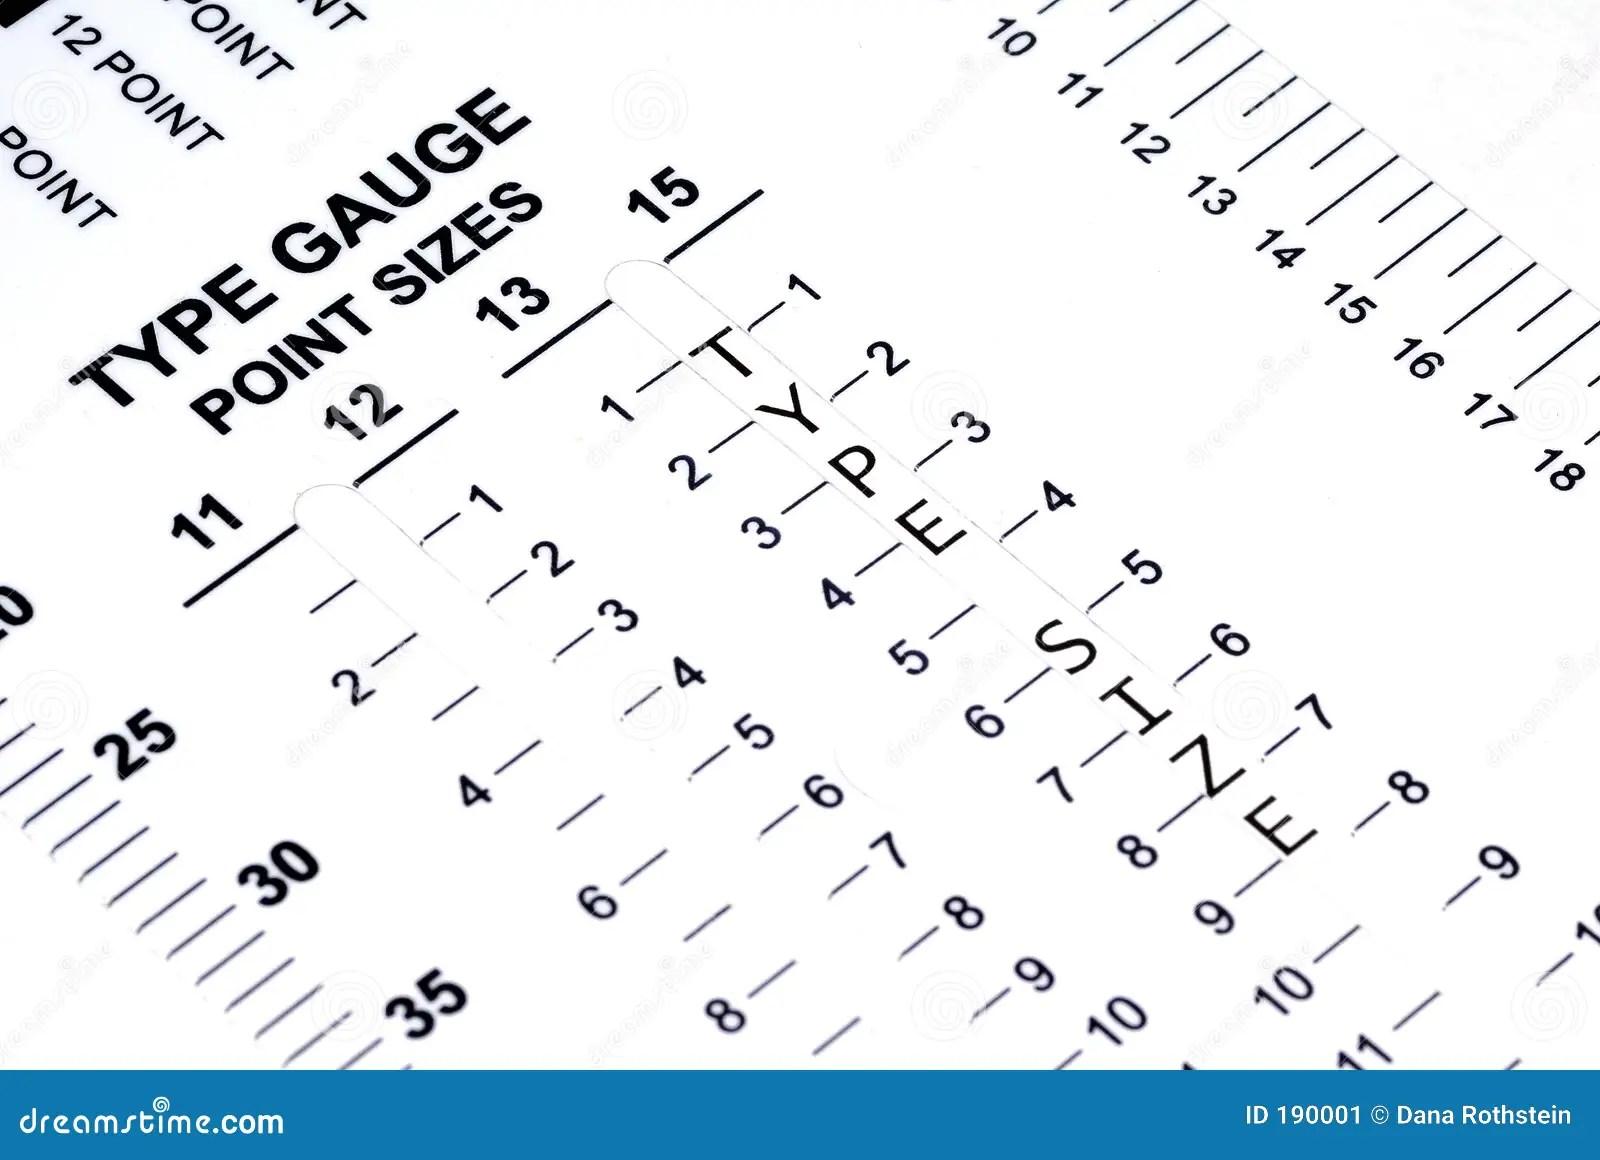 Type Gauge Stock Image Image Of Type Size Design Print